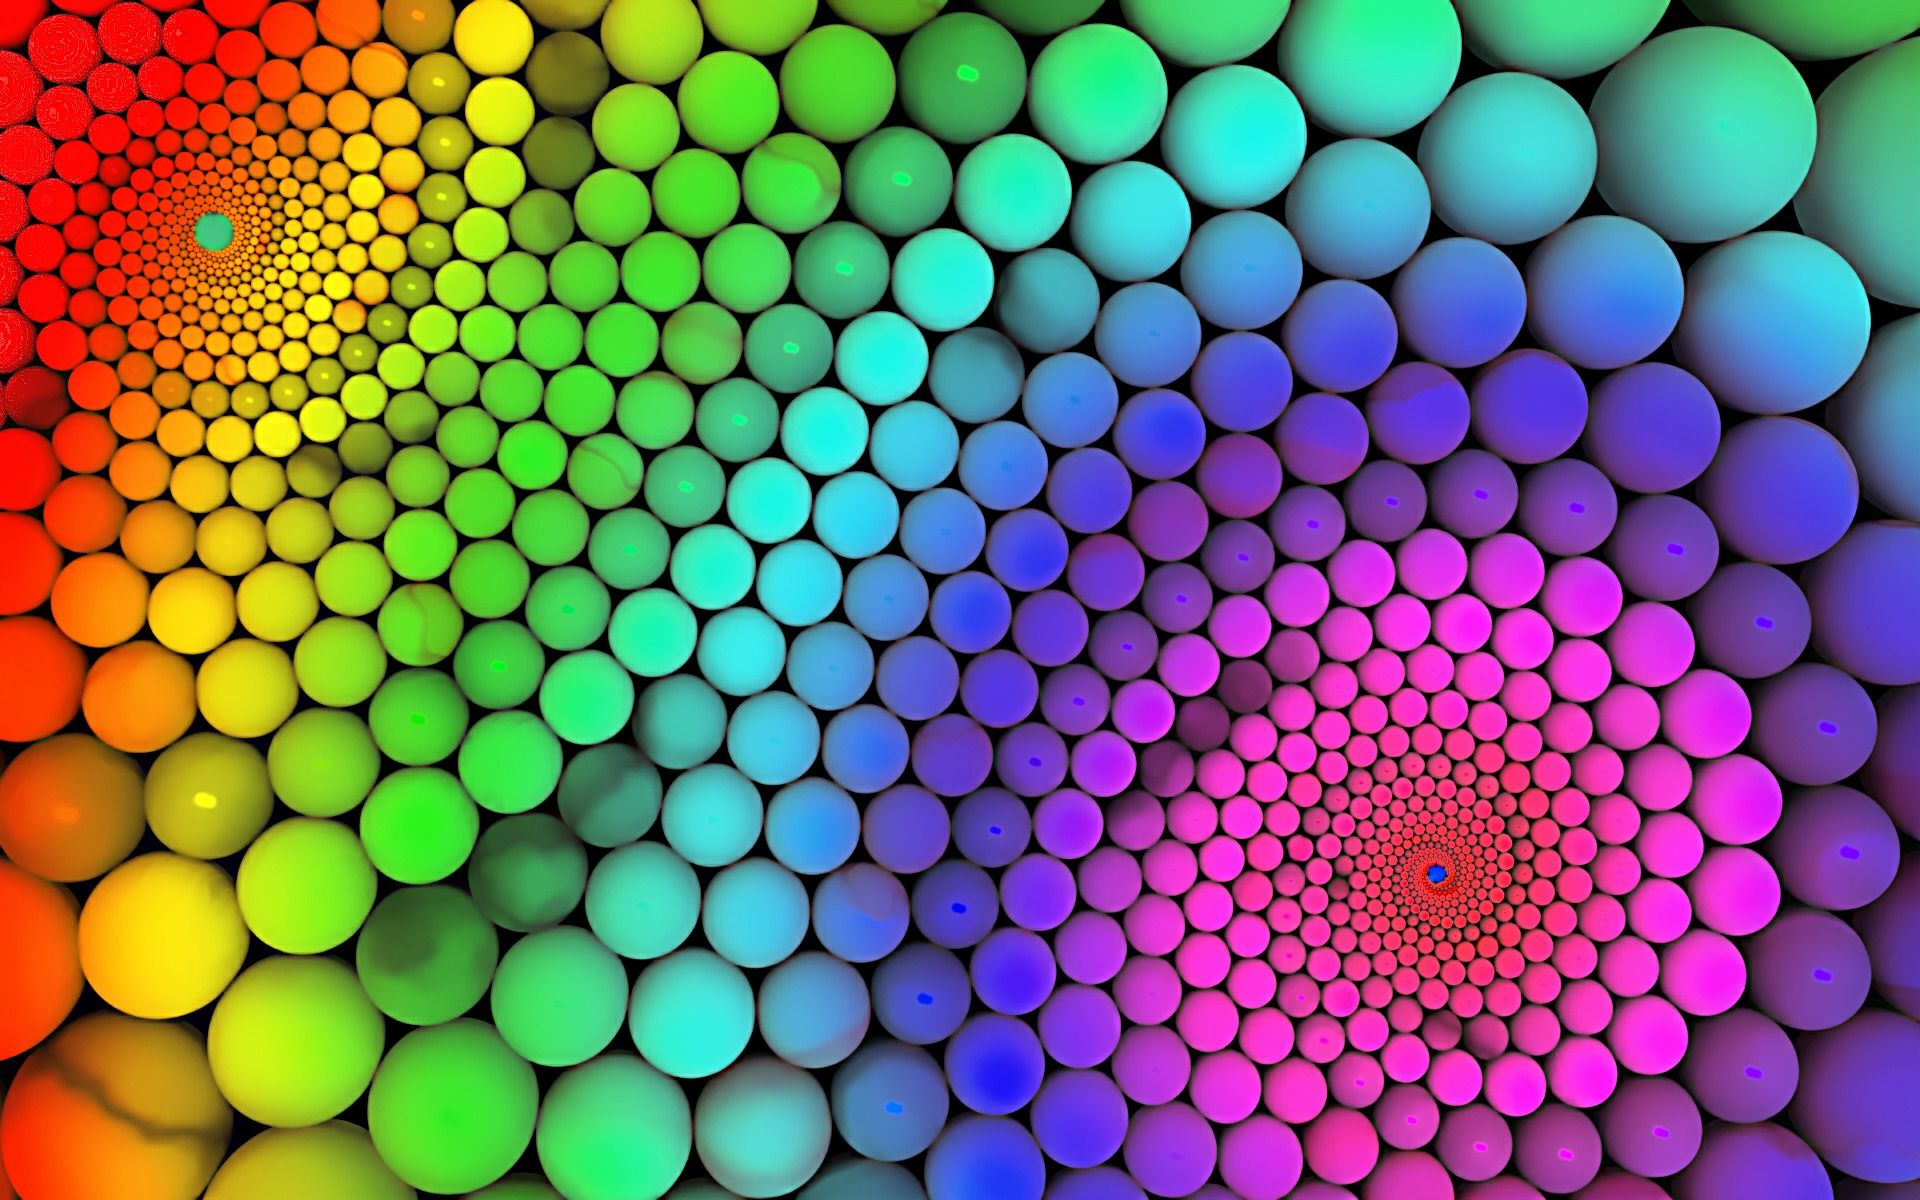 Molecular Geometry Wallpaper Abstract 3d Wallpaper Via Http Wallpoper Com Rainbow Wallpaper Colorful Wallpaper Optical Illusions For Kids